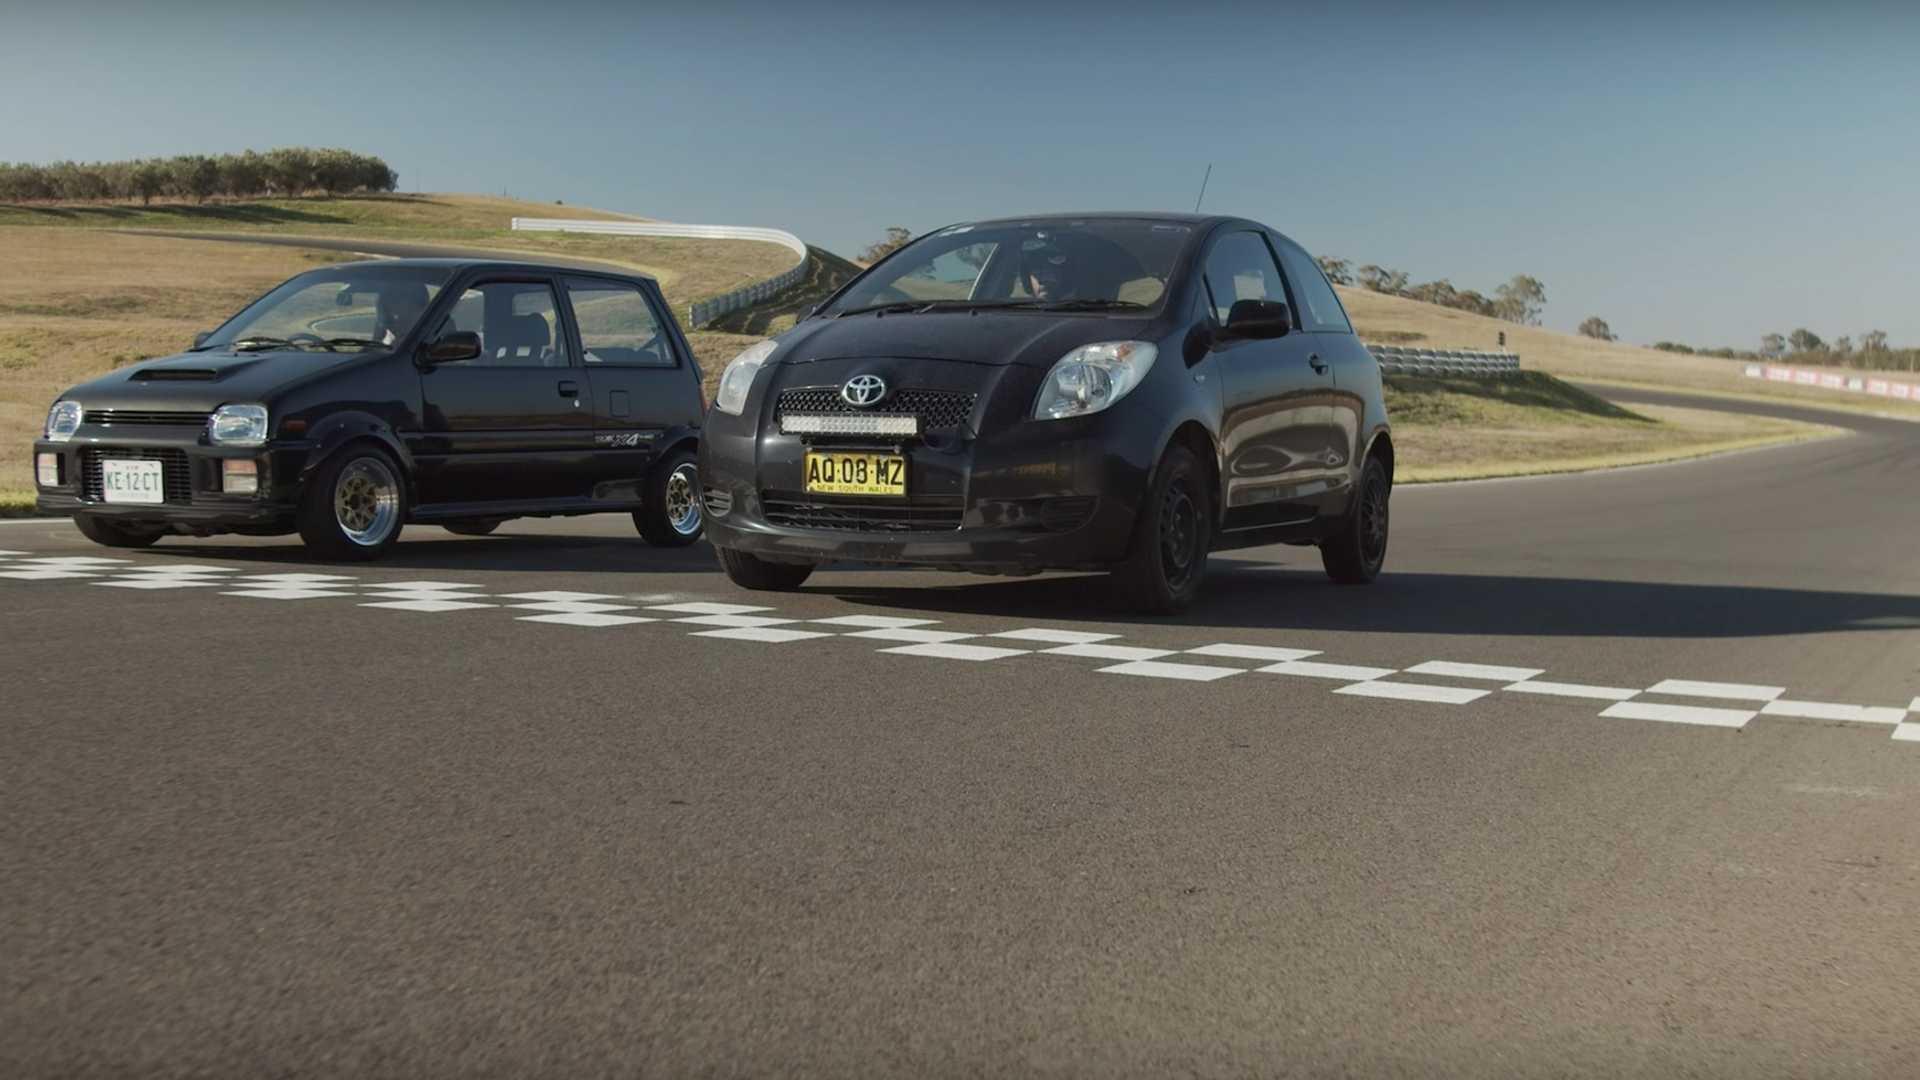 Daihatsu Mira Fights Toyota Yaris In City Cars Track Duel